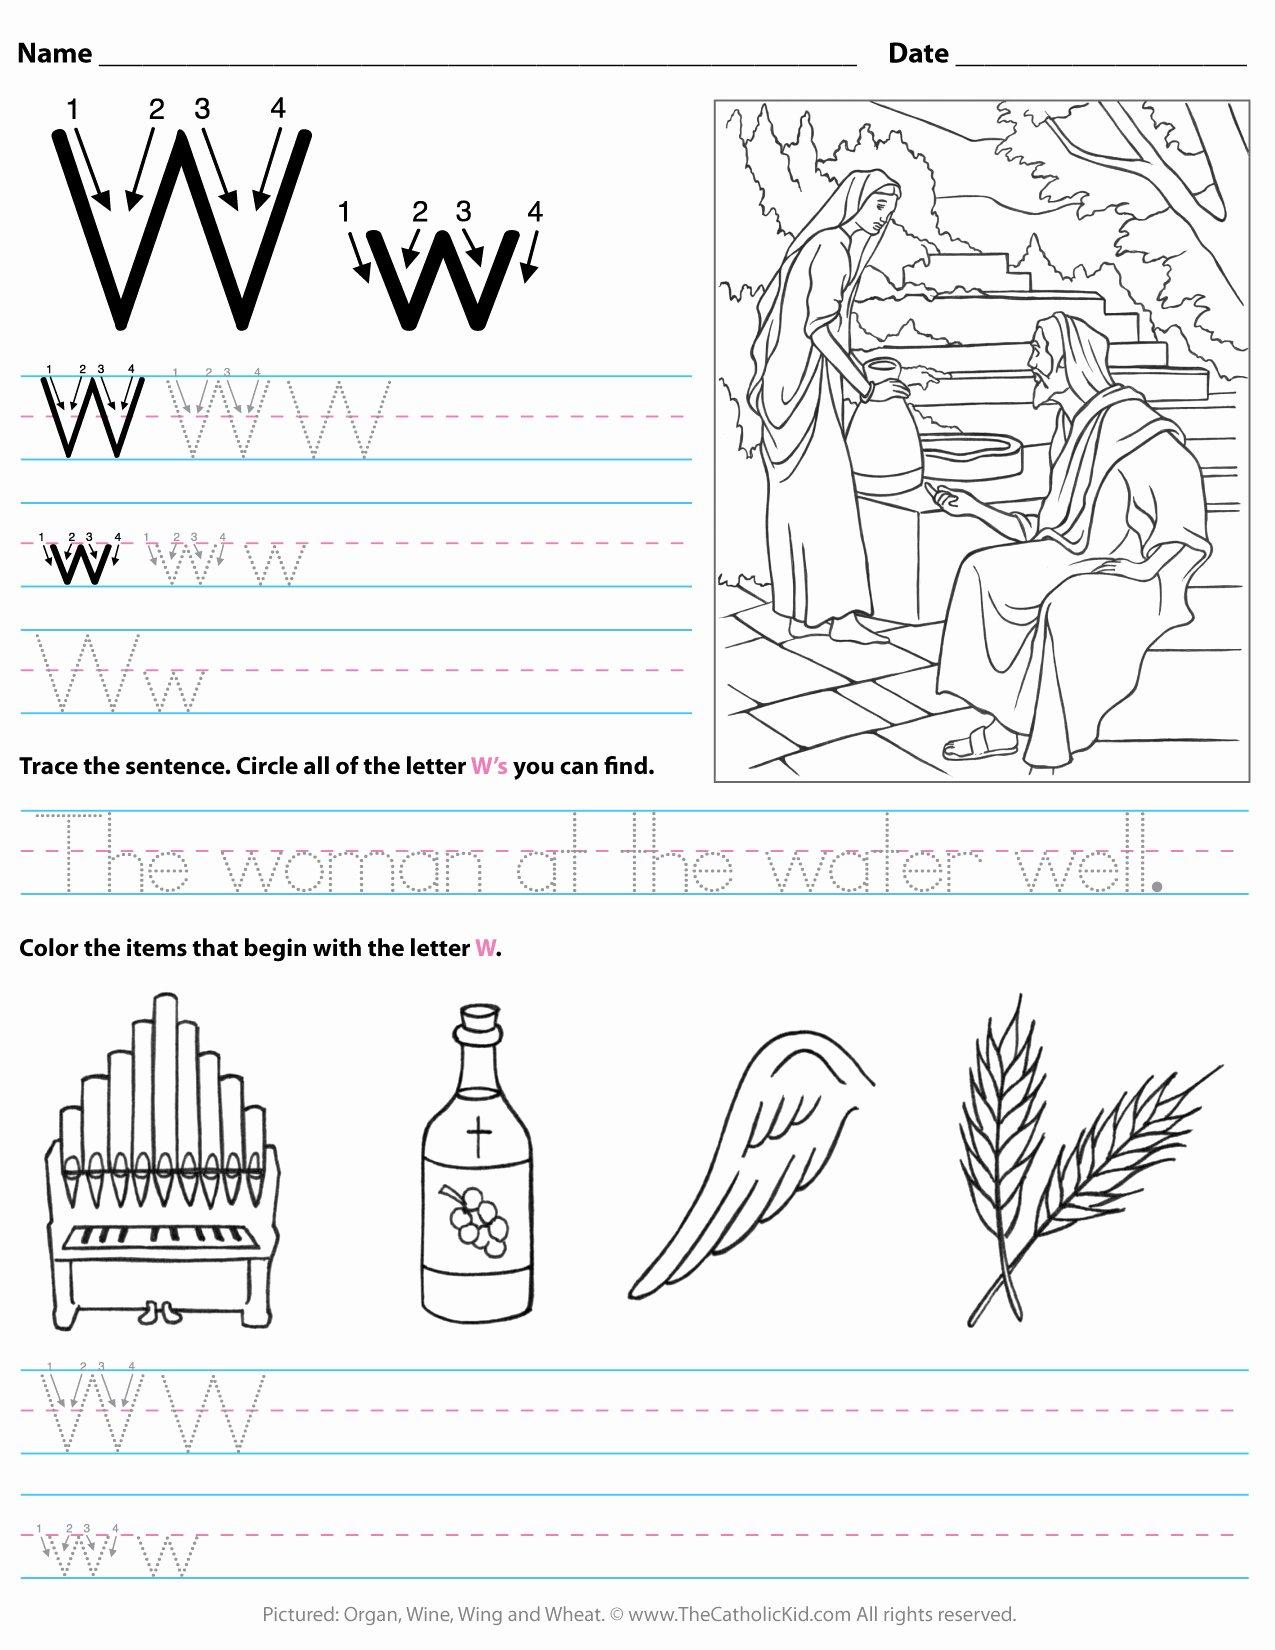 Letter W Worksheets for Preschoolers New Catholic Alphabet Letter W Worksheet Preschool Kindergarten